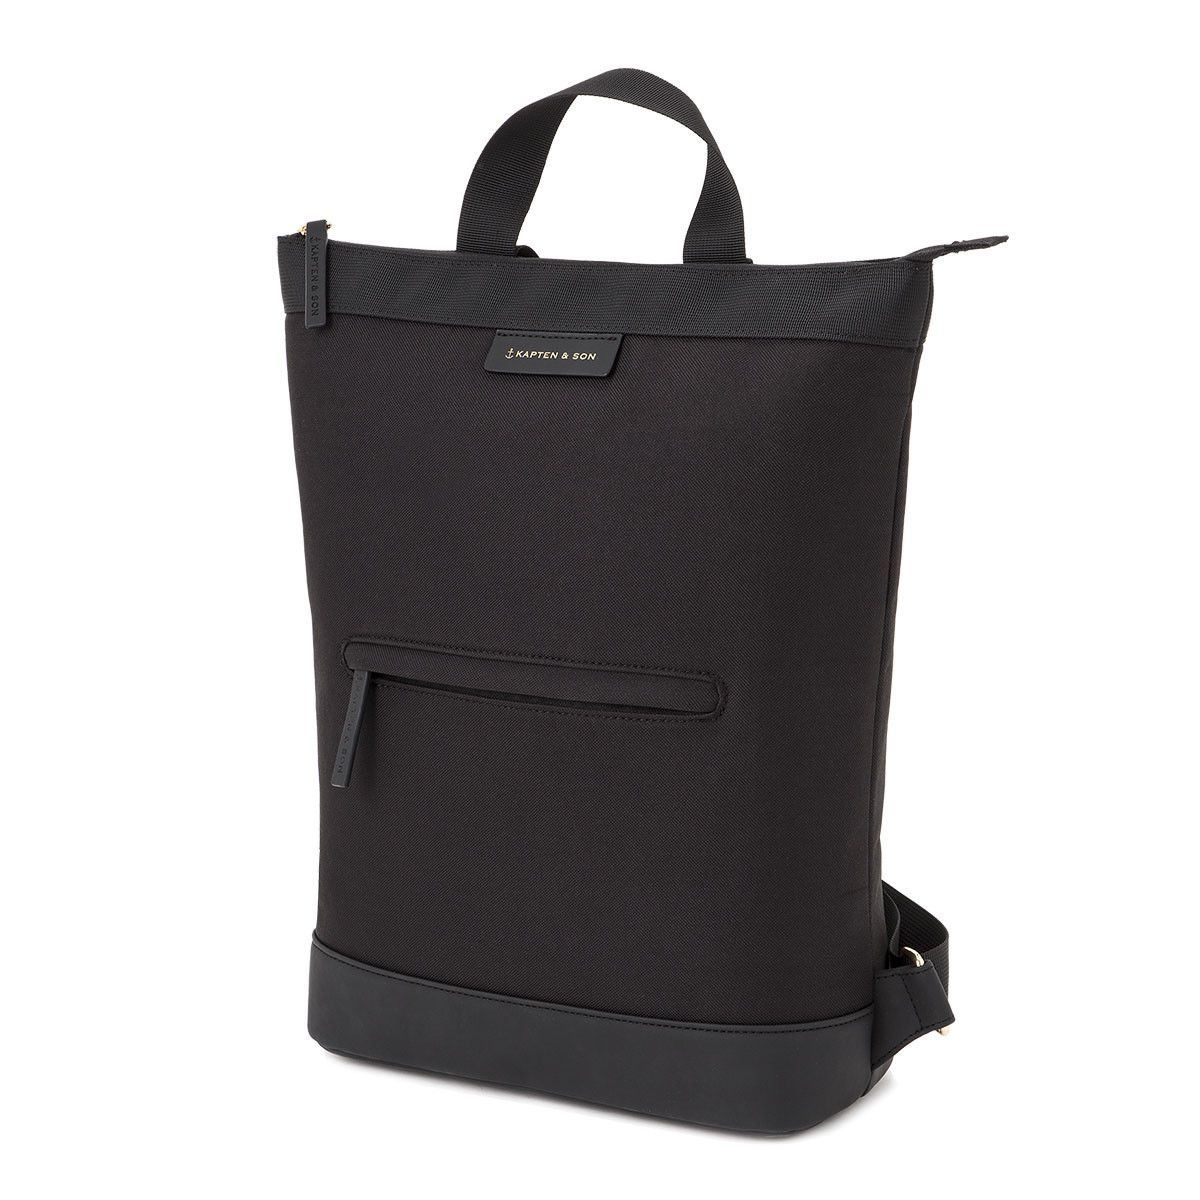 584bdd9dc9a Trendy black backpack